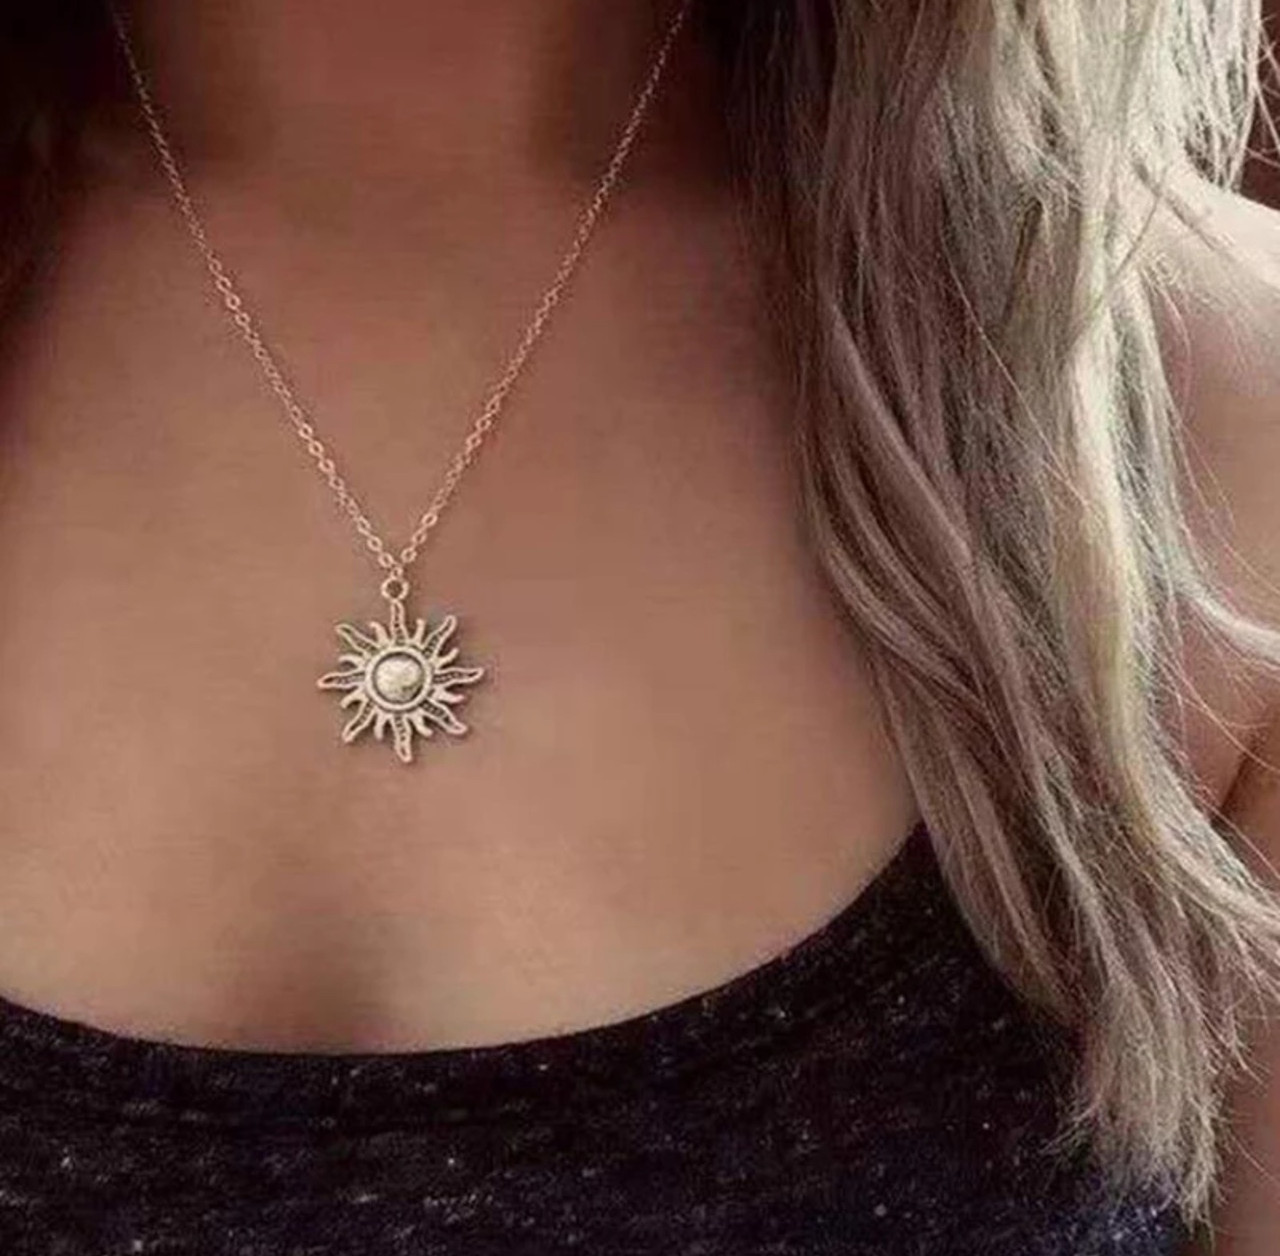 Цепочка кулон ожерелье солнце очень красивое